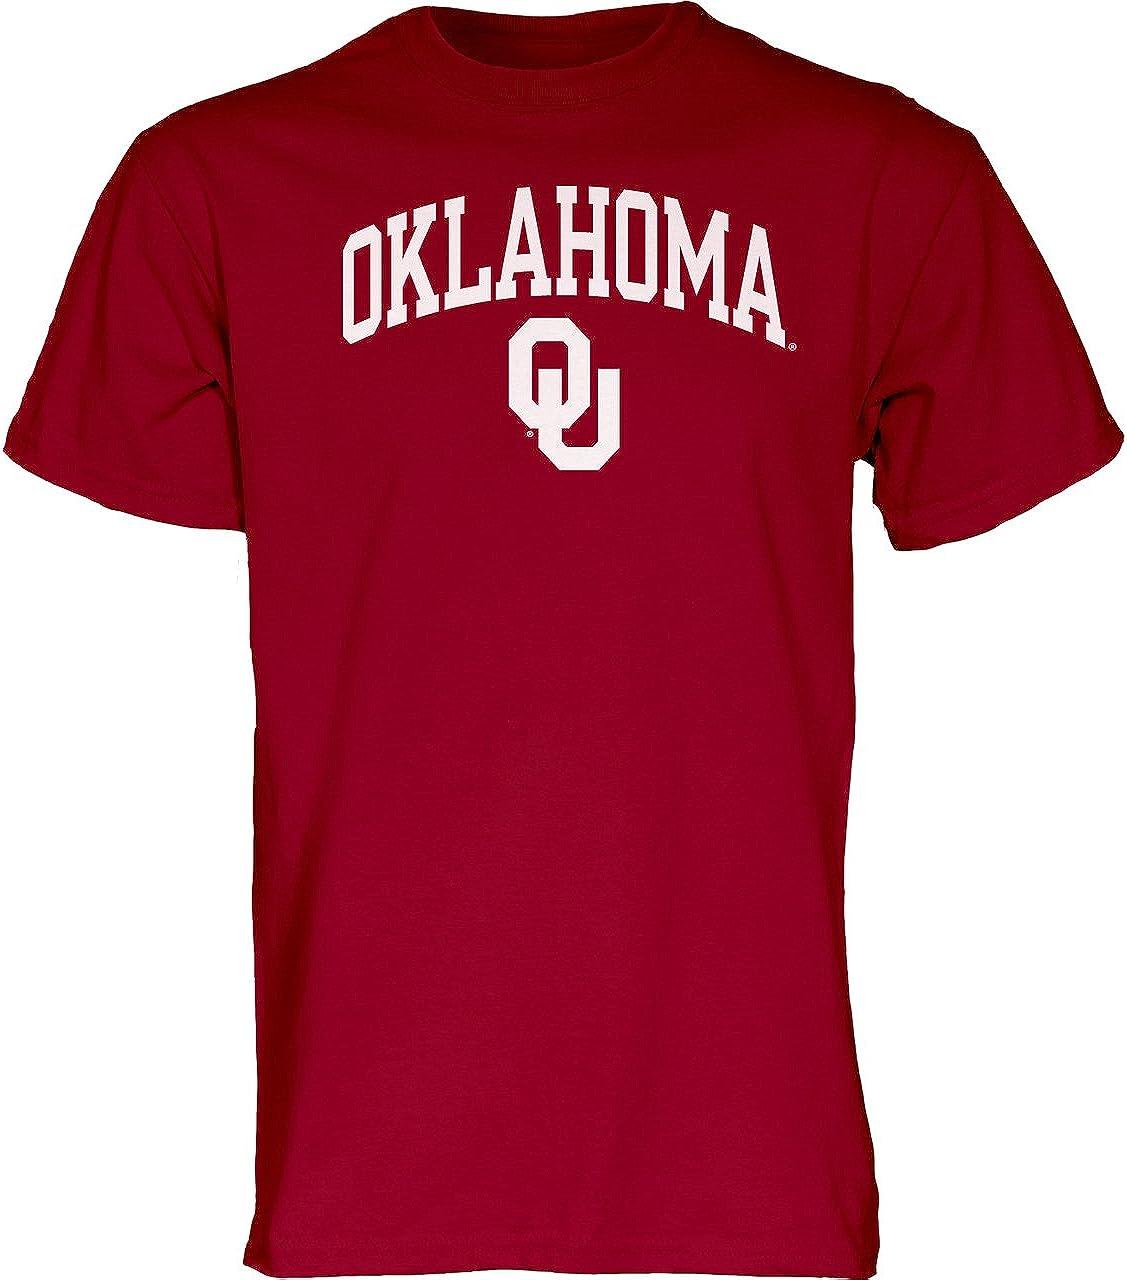 XX-Large Cardinal Blue 84 Oklahoma Sooners Adult Arch Logo T-Shirt